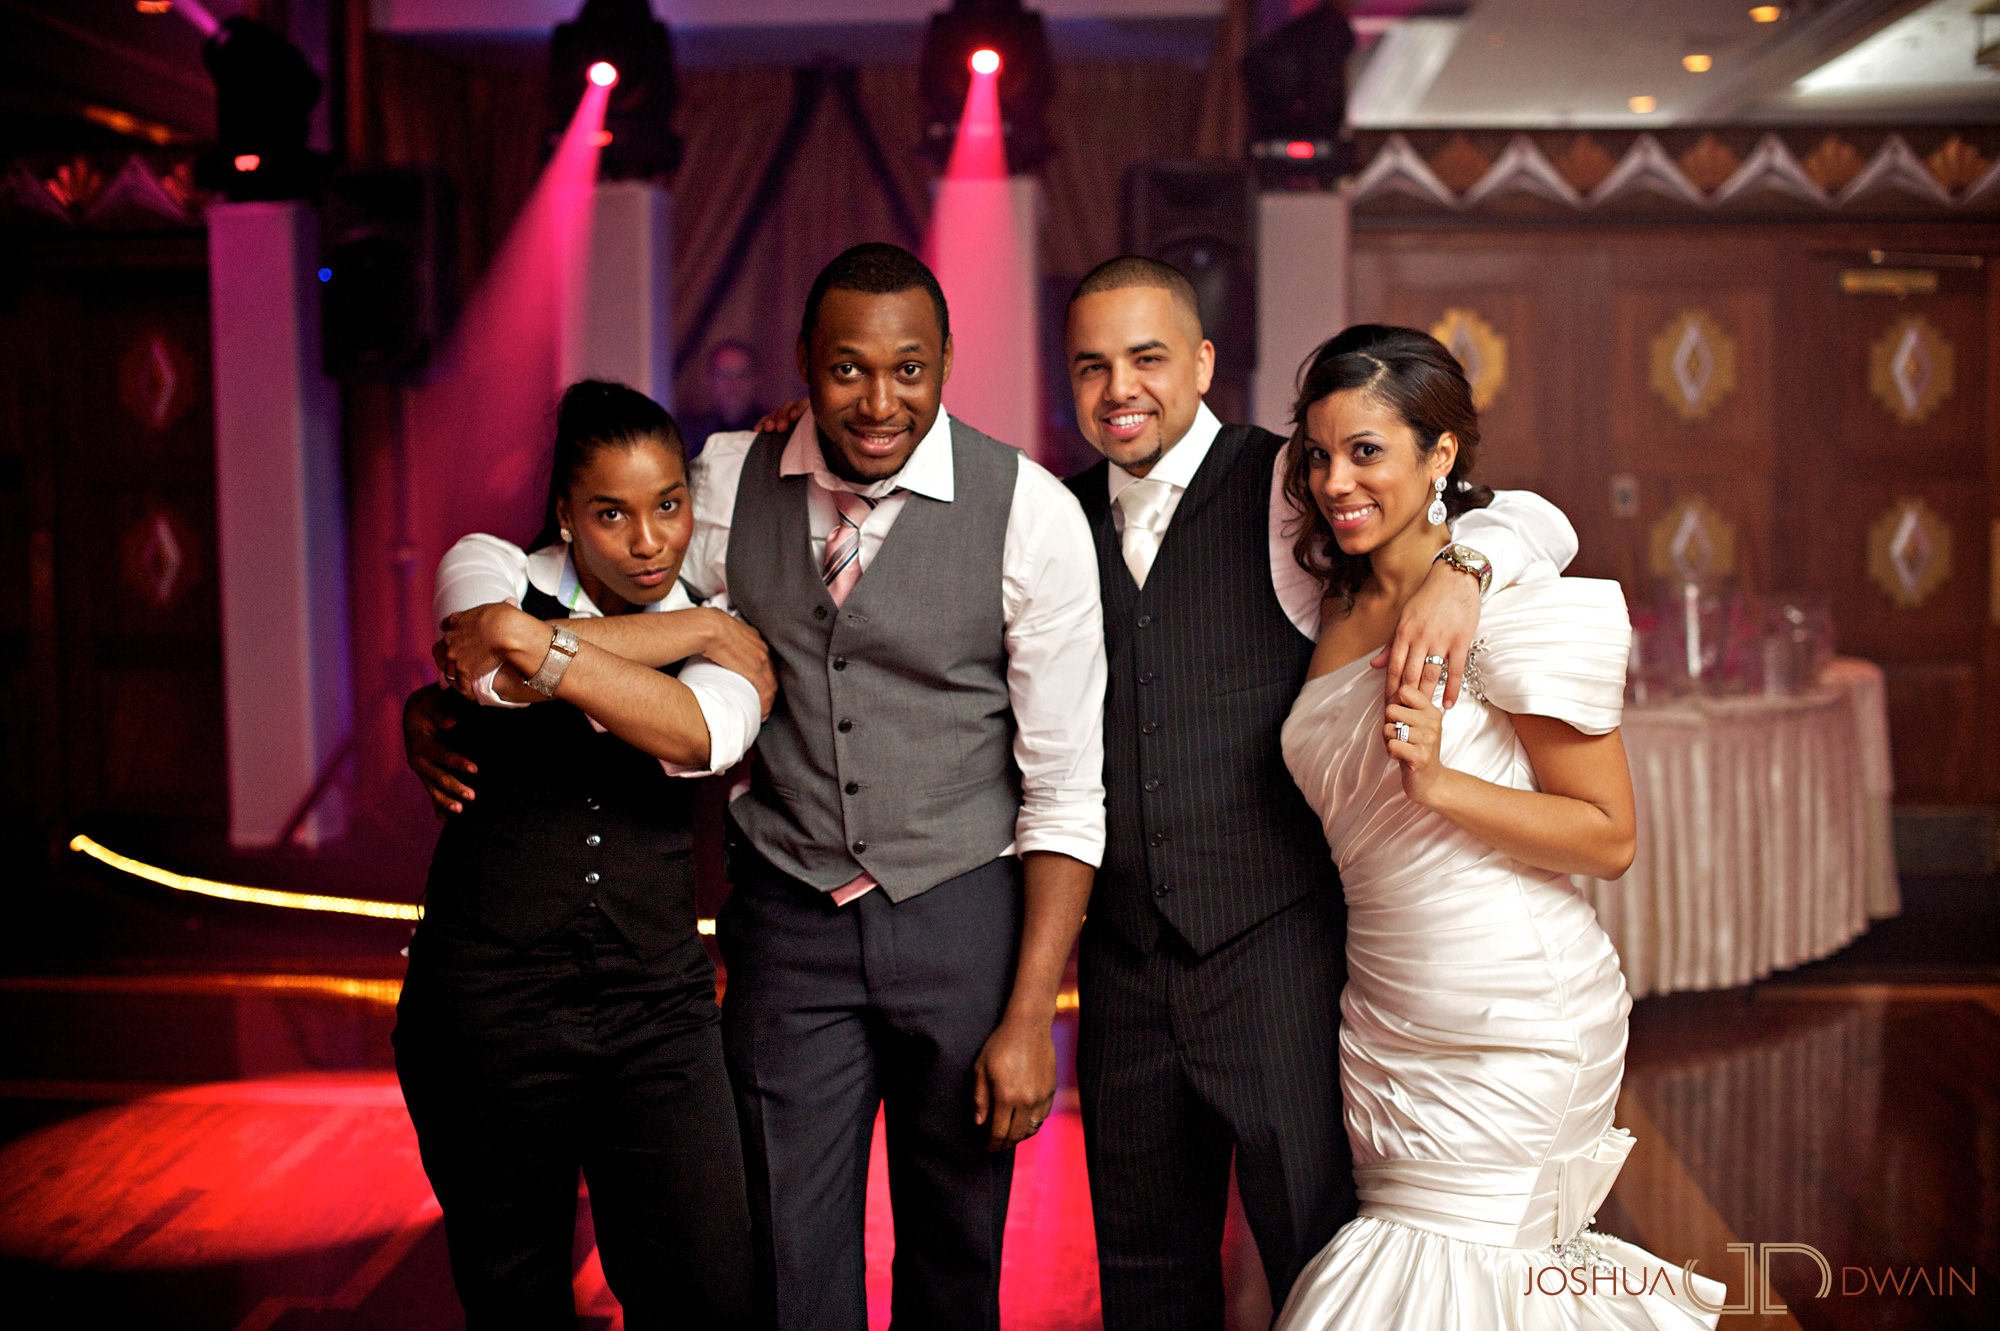 carolina-hector-033-chateau-briandlong-island-new-york-wedding-photographer-joshua-dwain-2011-05-14_ch_0971